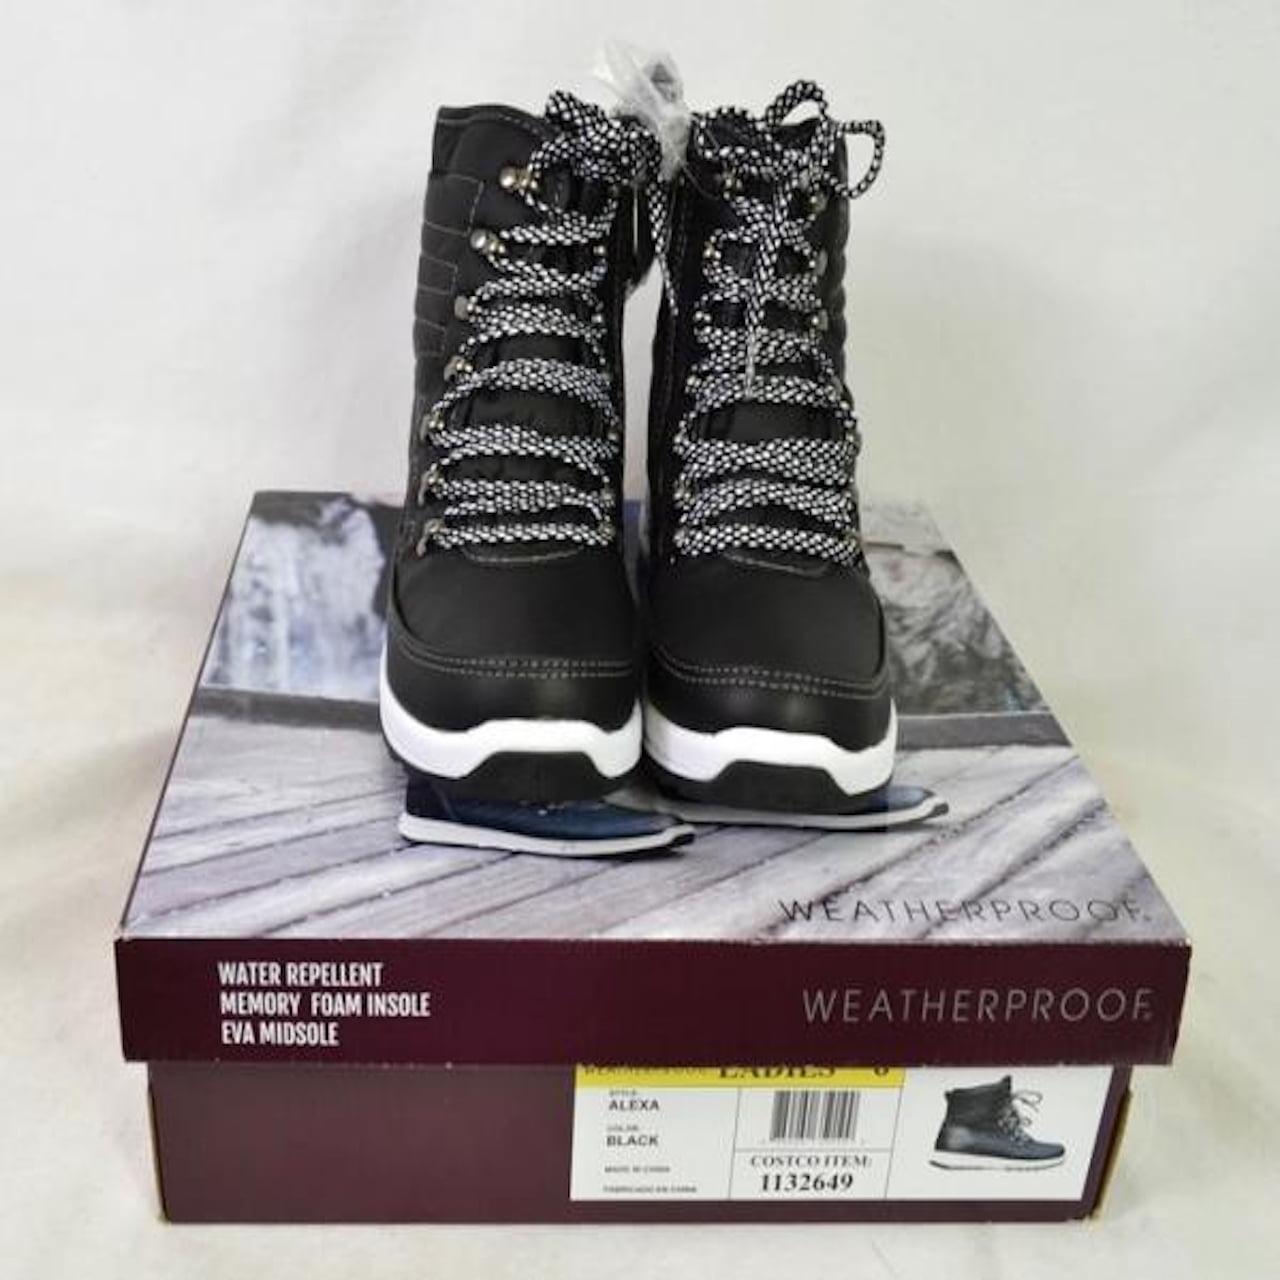 Weatherproof Ladies/' Alexa Memory Foam Winter Boots